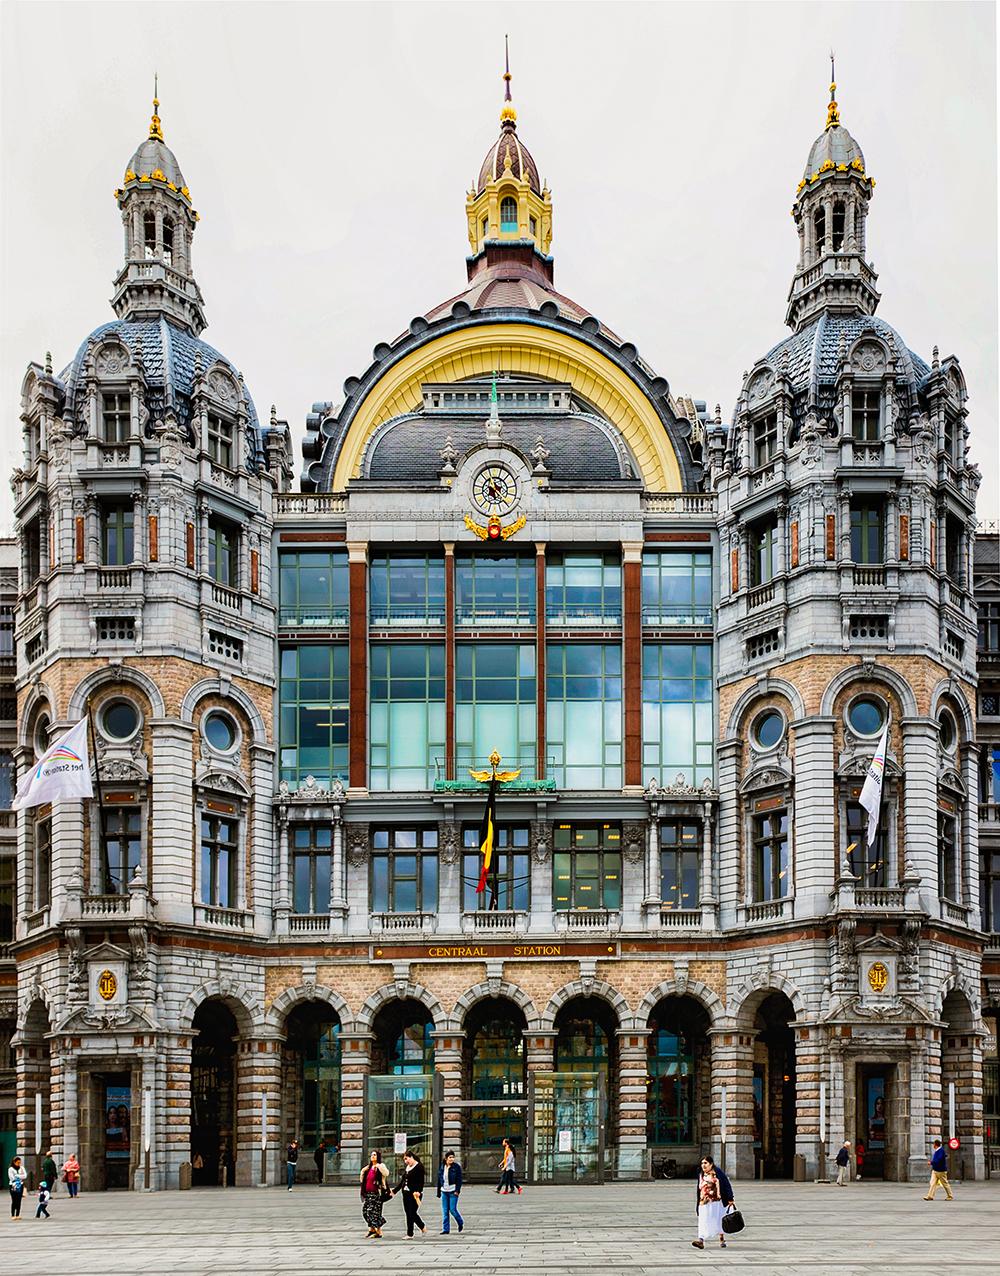 Antwerp train station exterior Antwerp Belgium